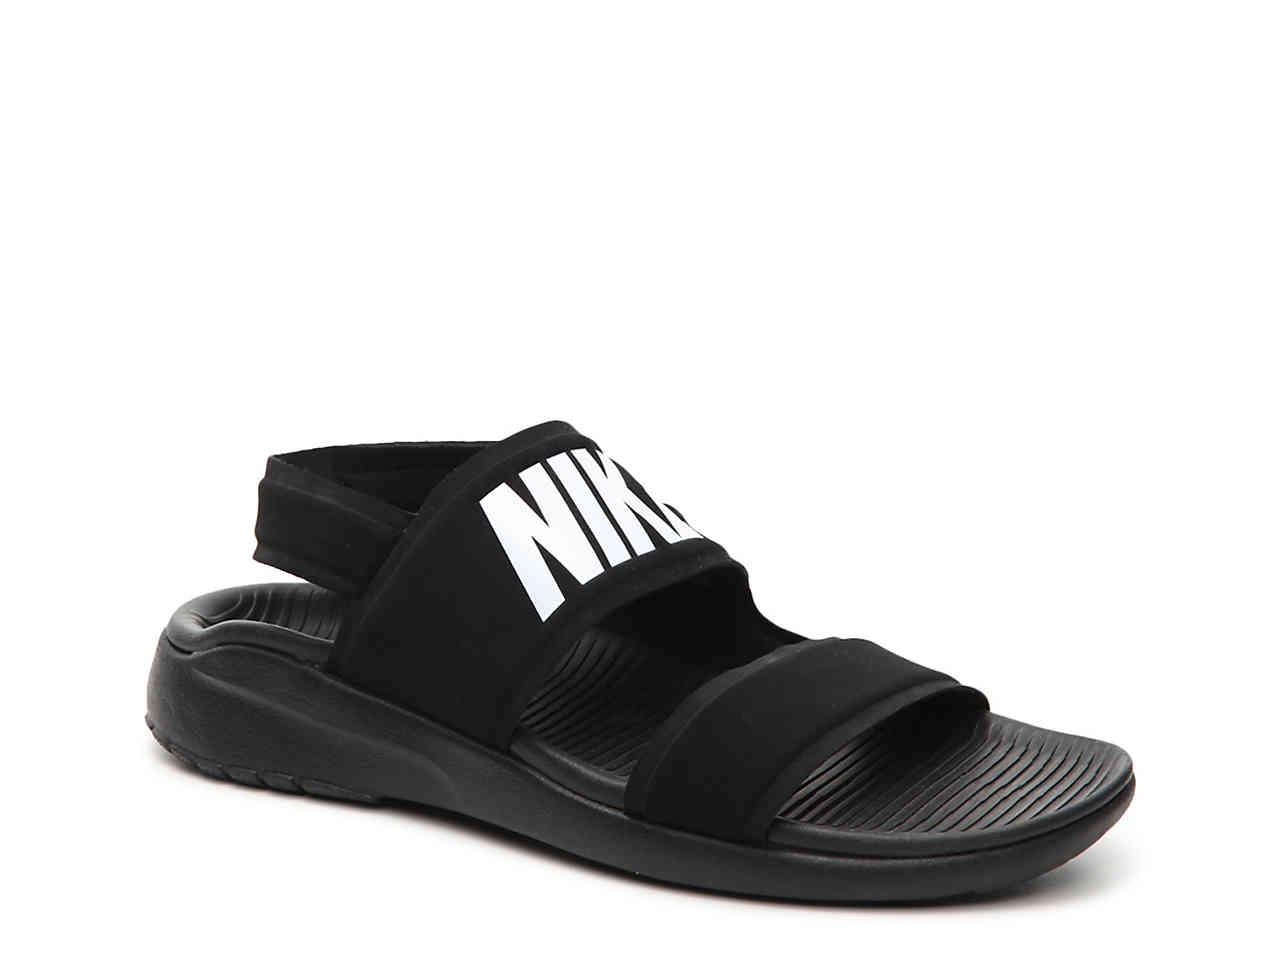 Nike. Men's Black Tanjun Sport Sandal